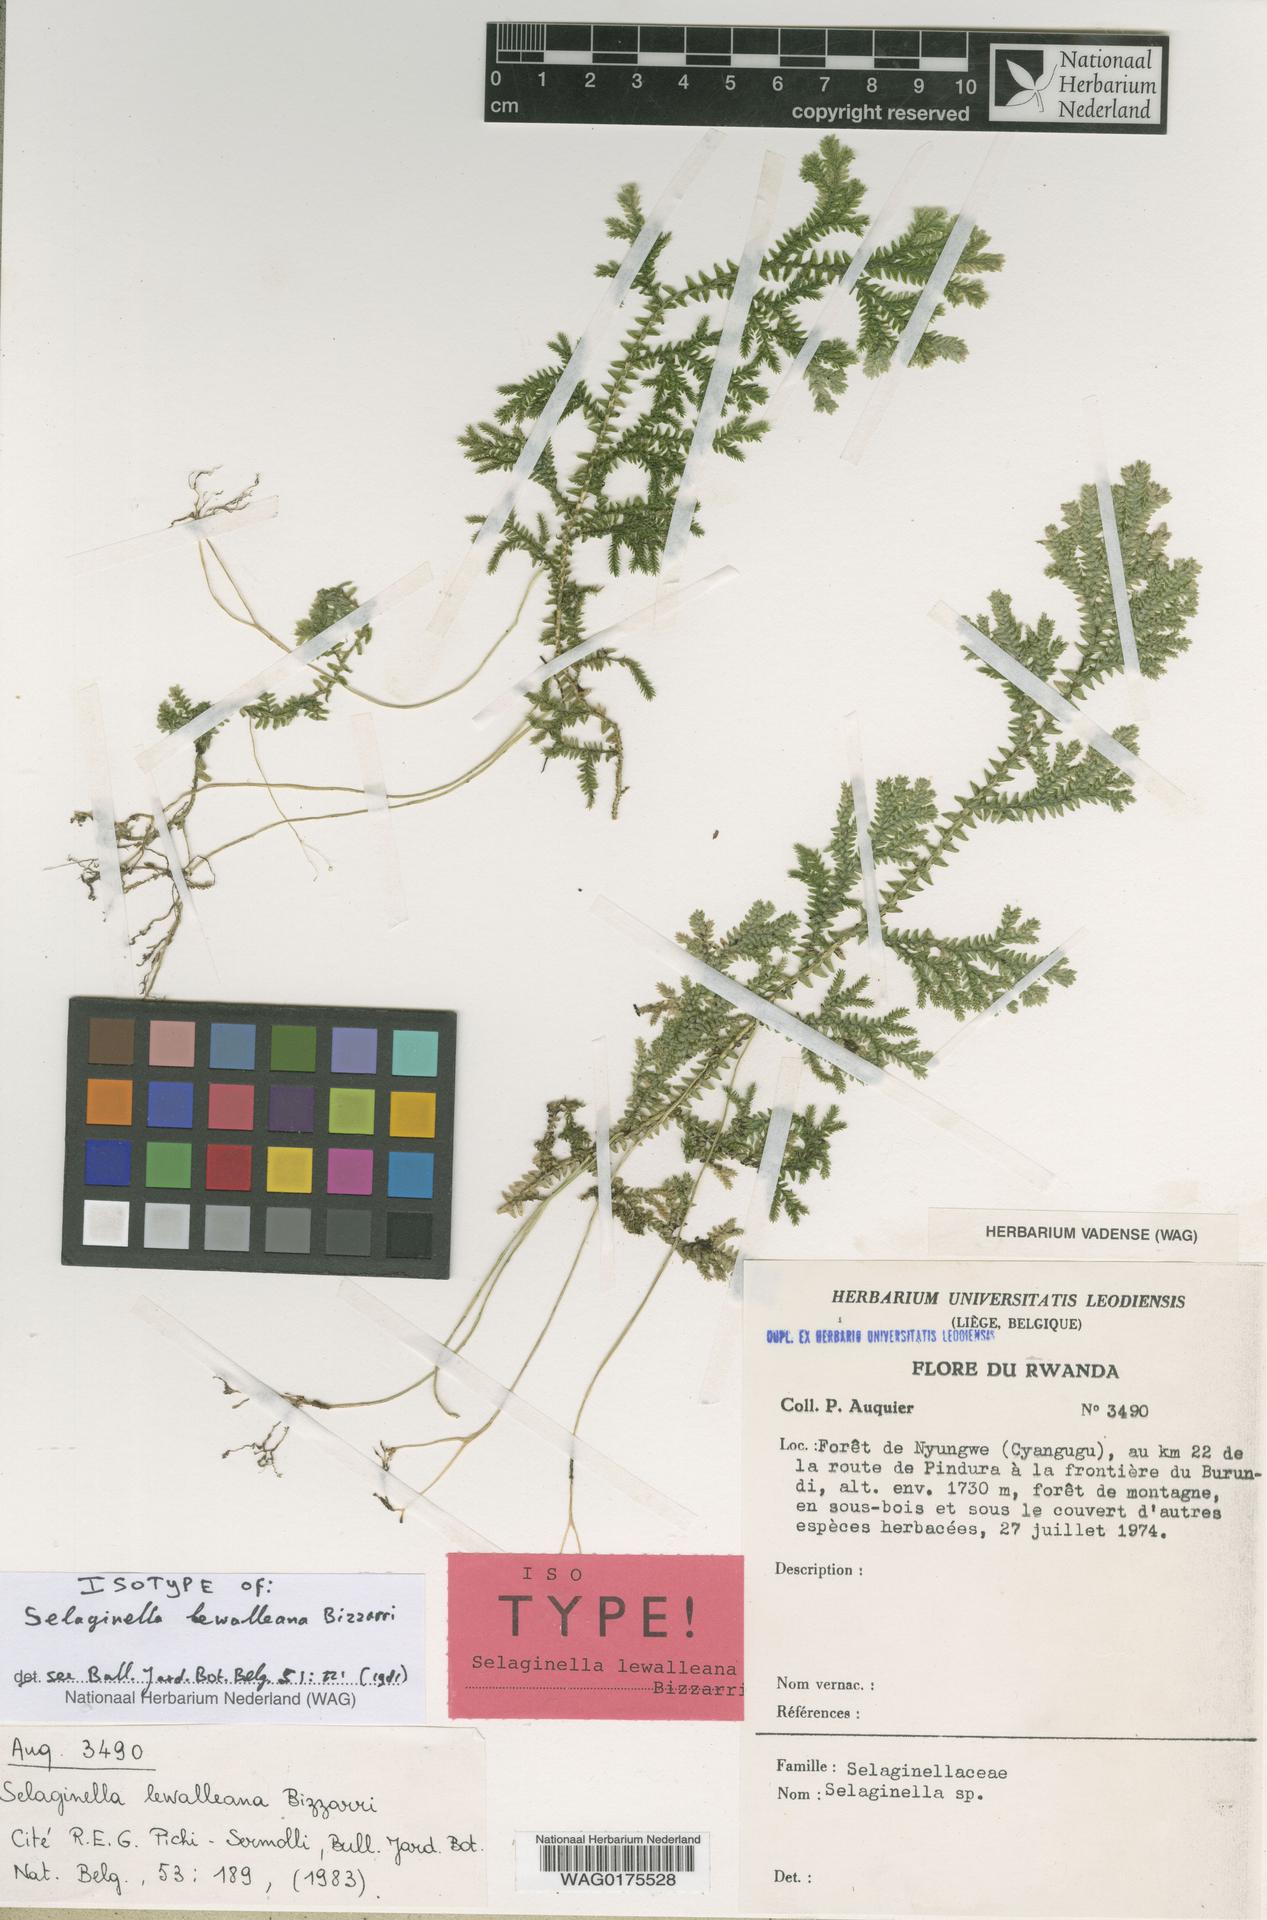 WAG.1725554 | Selaginella lewalleana Bizzarri